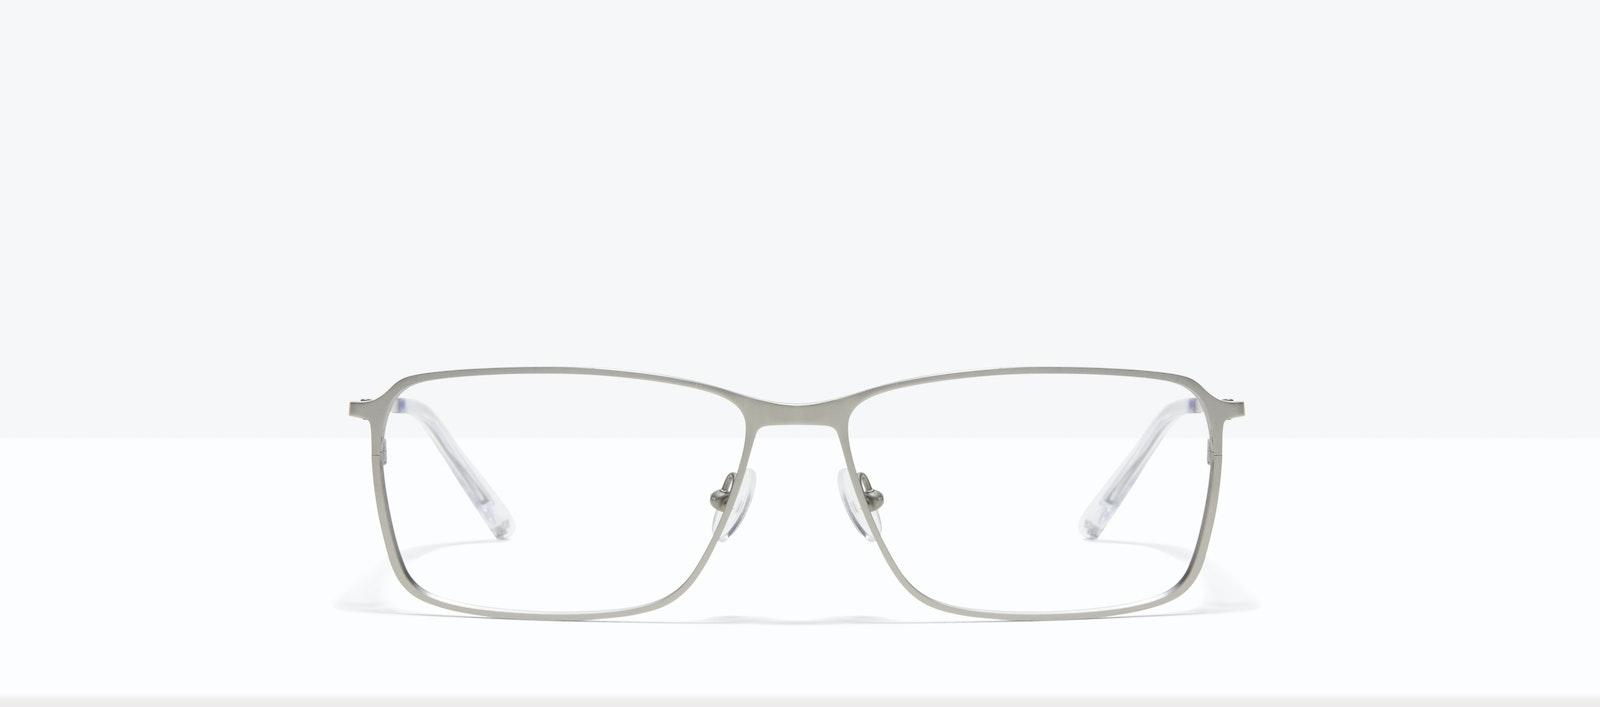 Affordable Fashion Glasses Square Eyeglasses Men Drive Silver Front